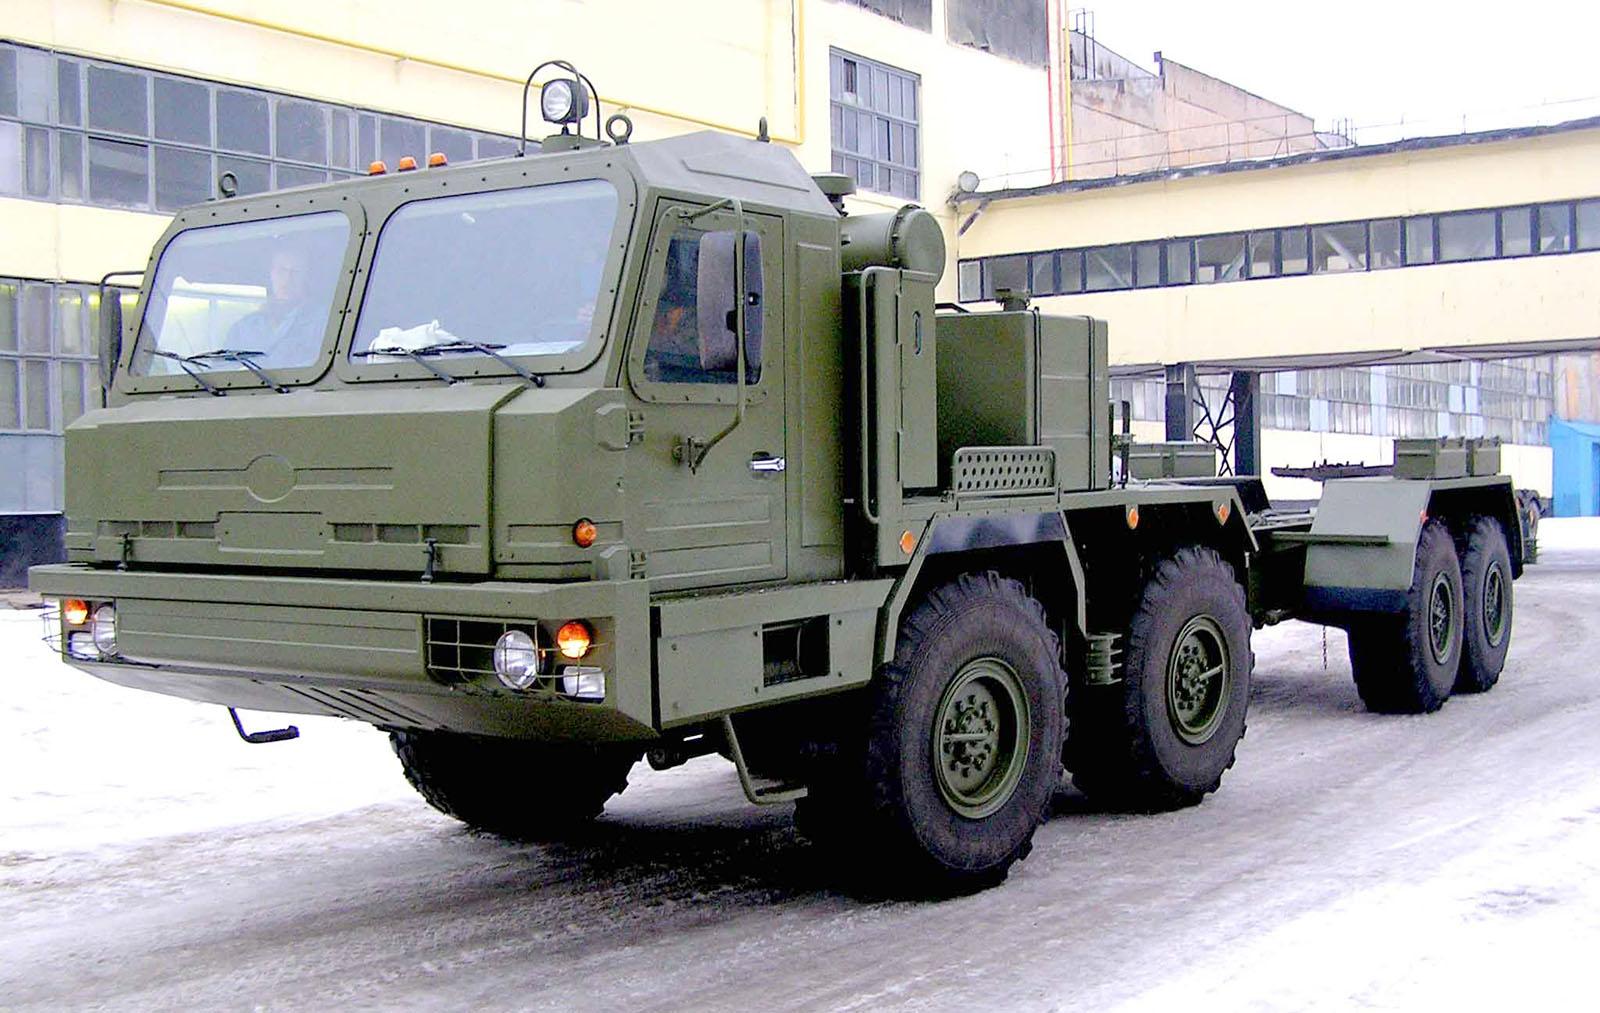 S-500 BAZ-6909-022-1S